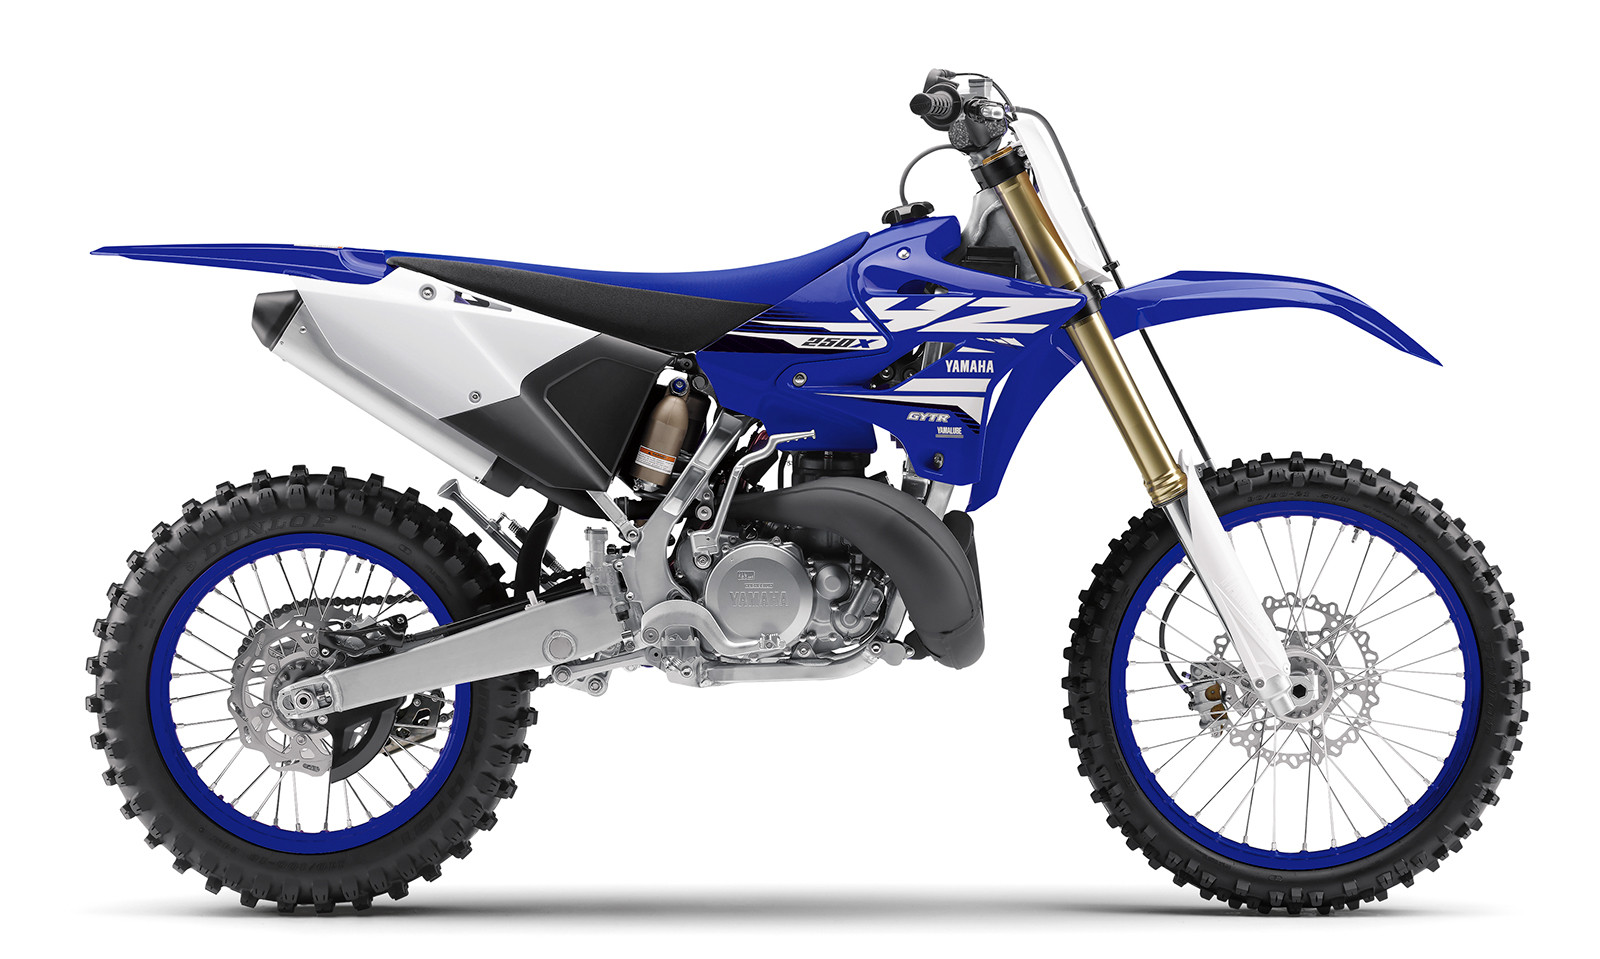 Yz 250 2019 >> First Look: 2018 Yamaha YZ Models - Motocross Feature Stories - Vital MX